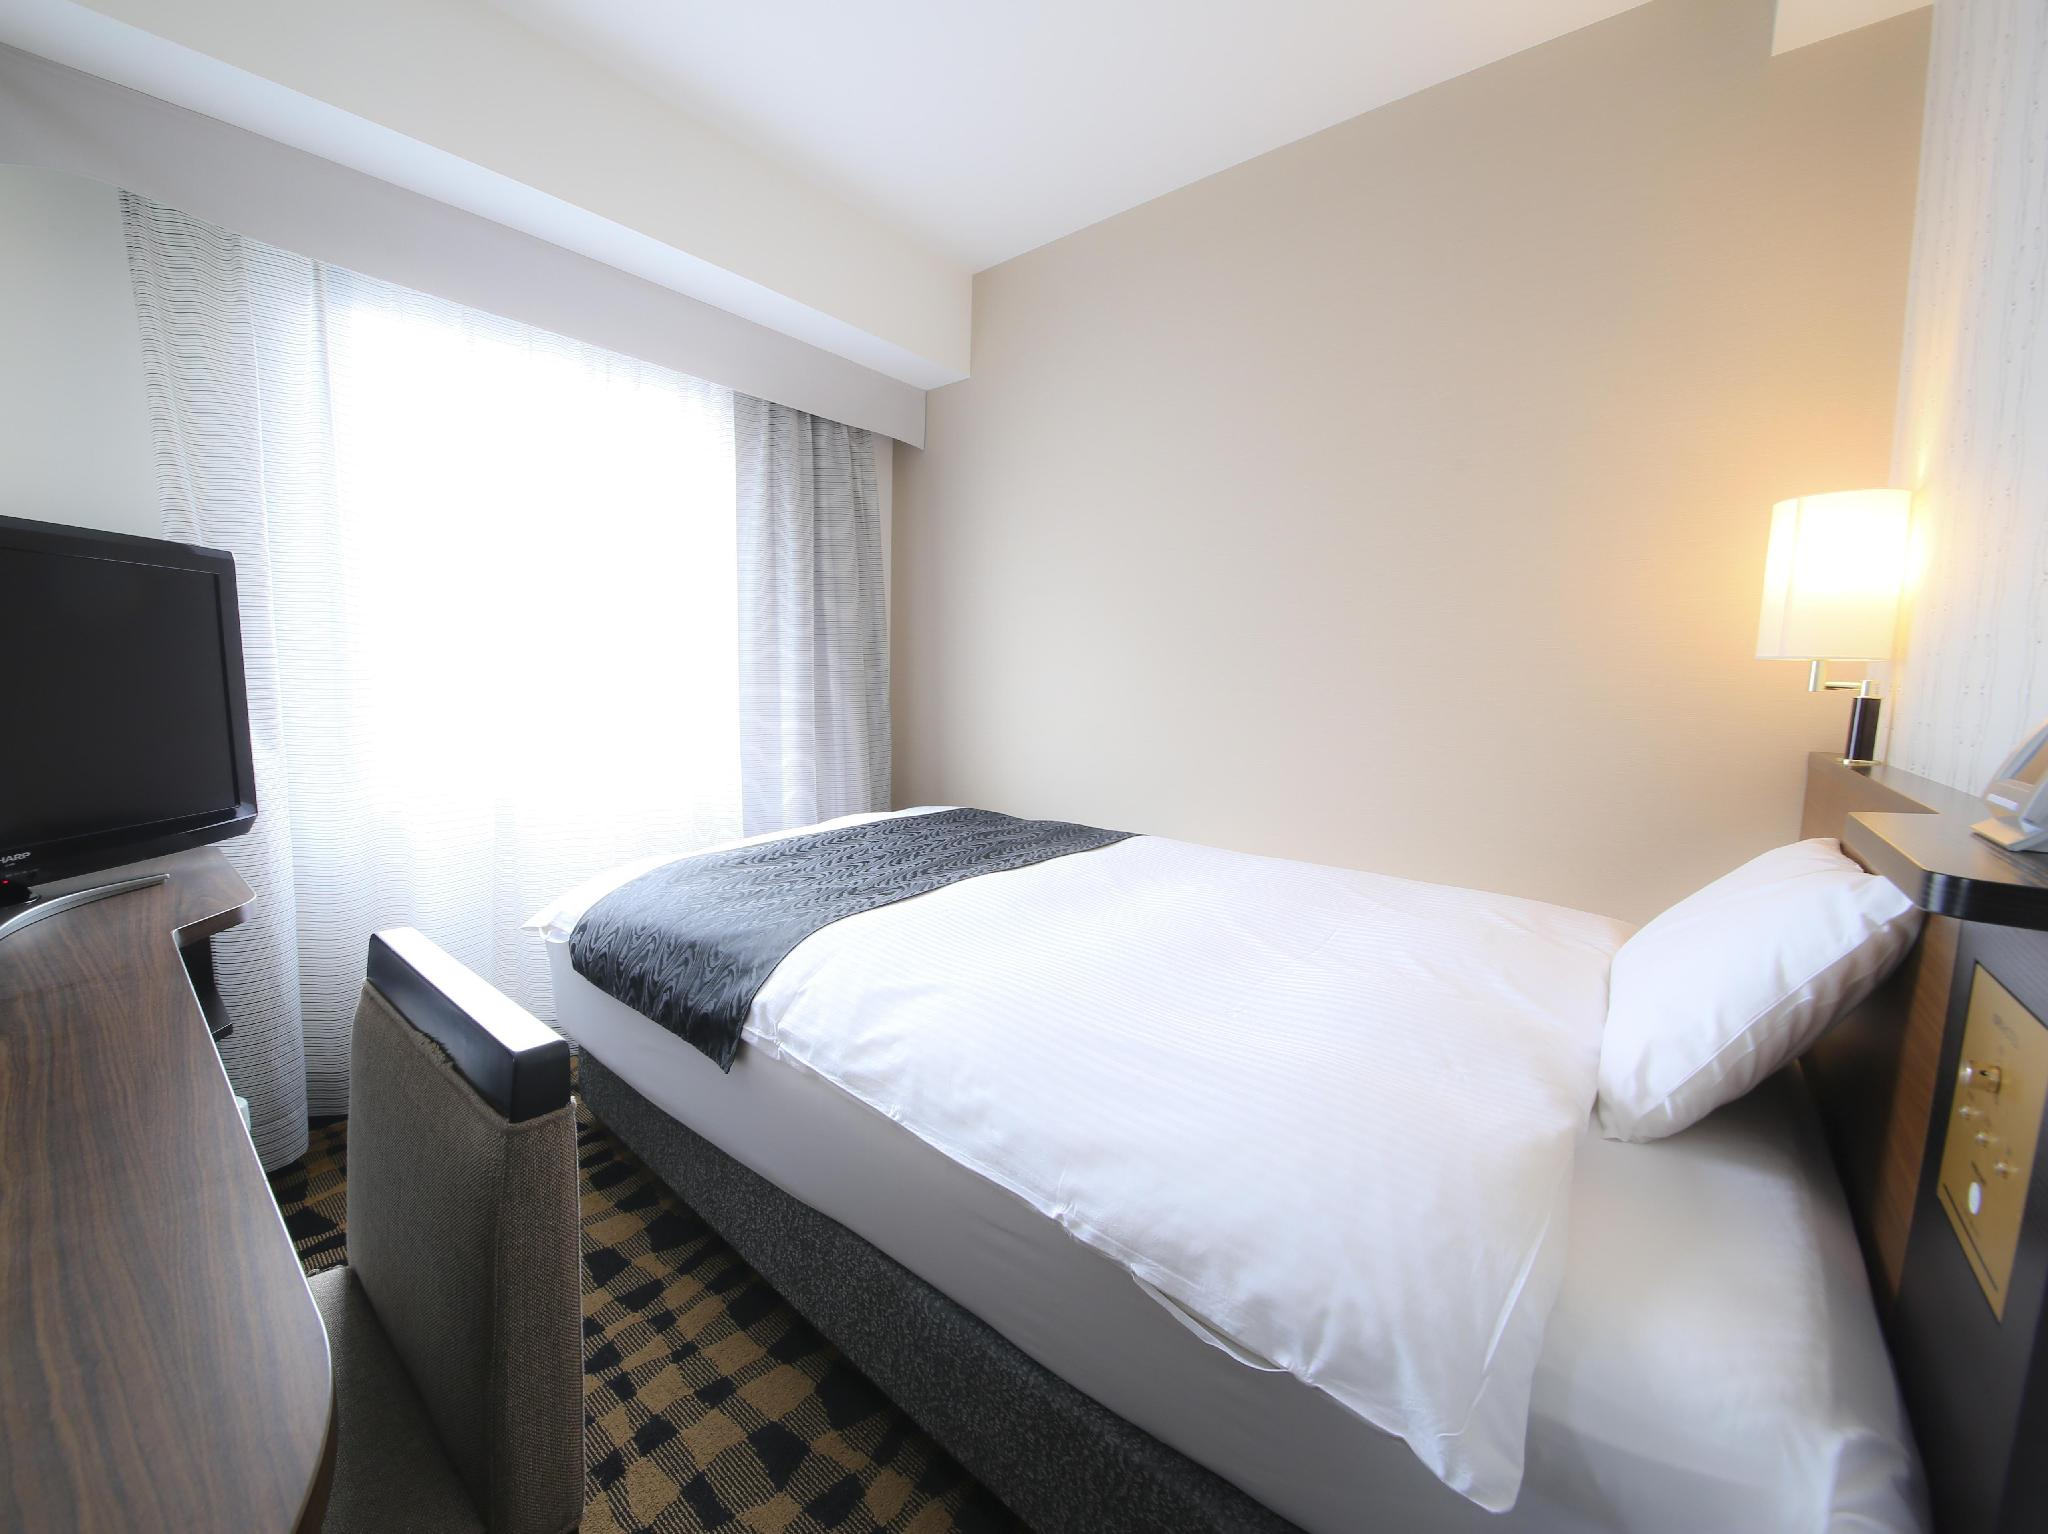 Apa Hotel Hatcyobori-eki-minami In Tokyo